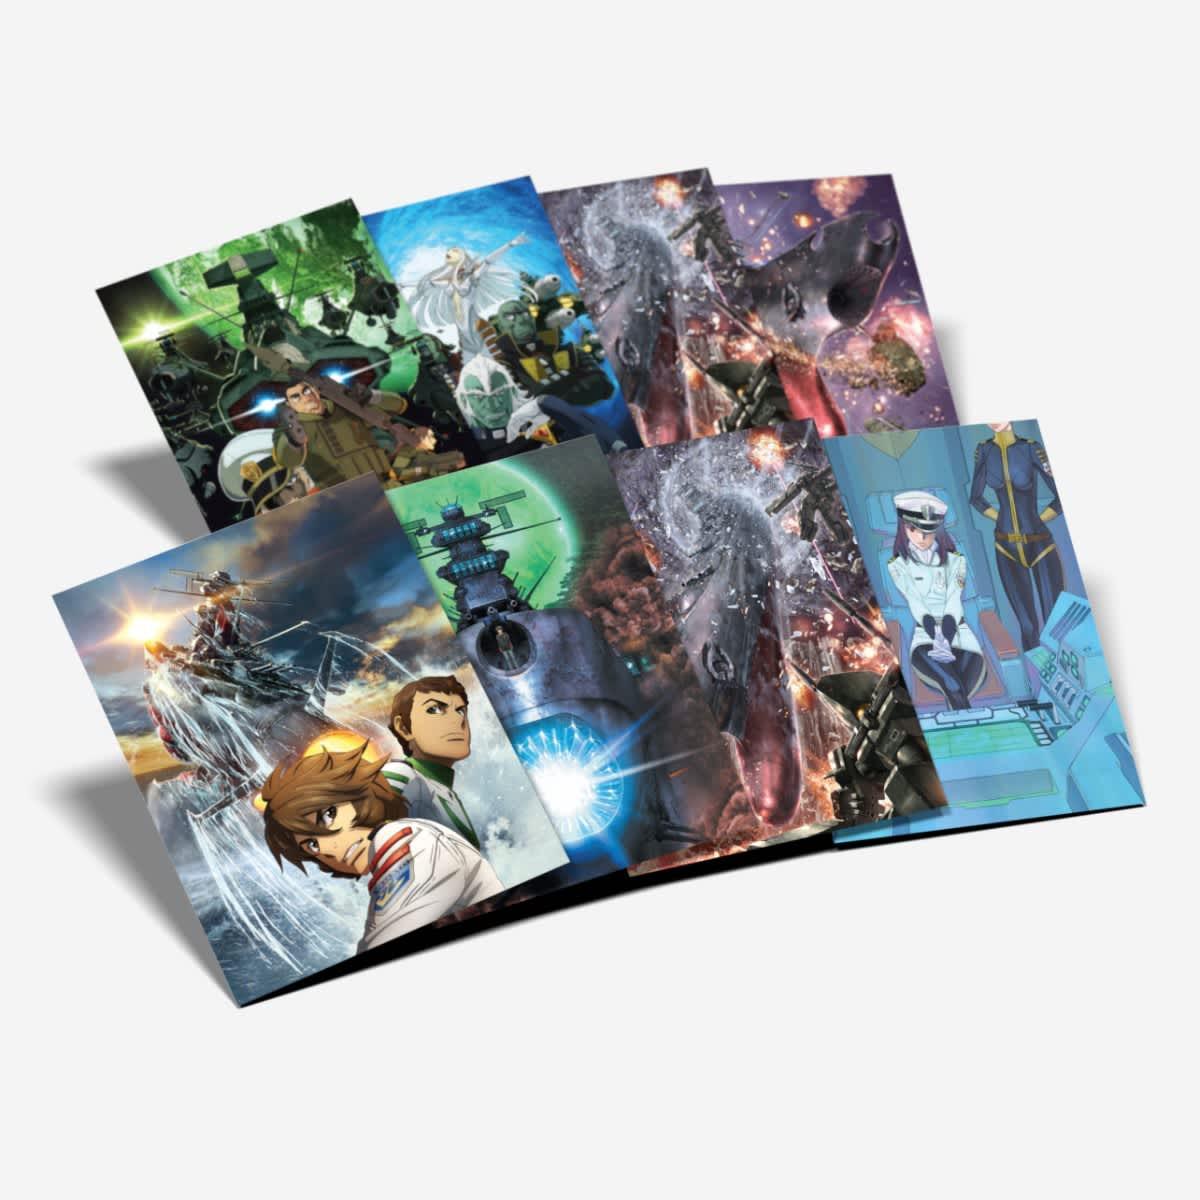 Star Blazers Space Battleship Yamato 2202 Part 1 Limited Edition Blu-ray/DVD